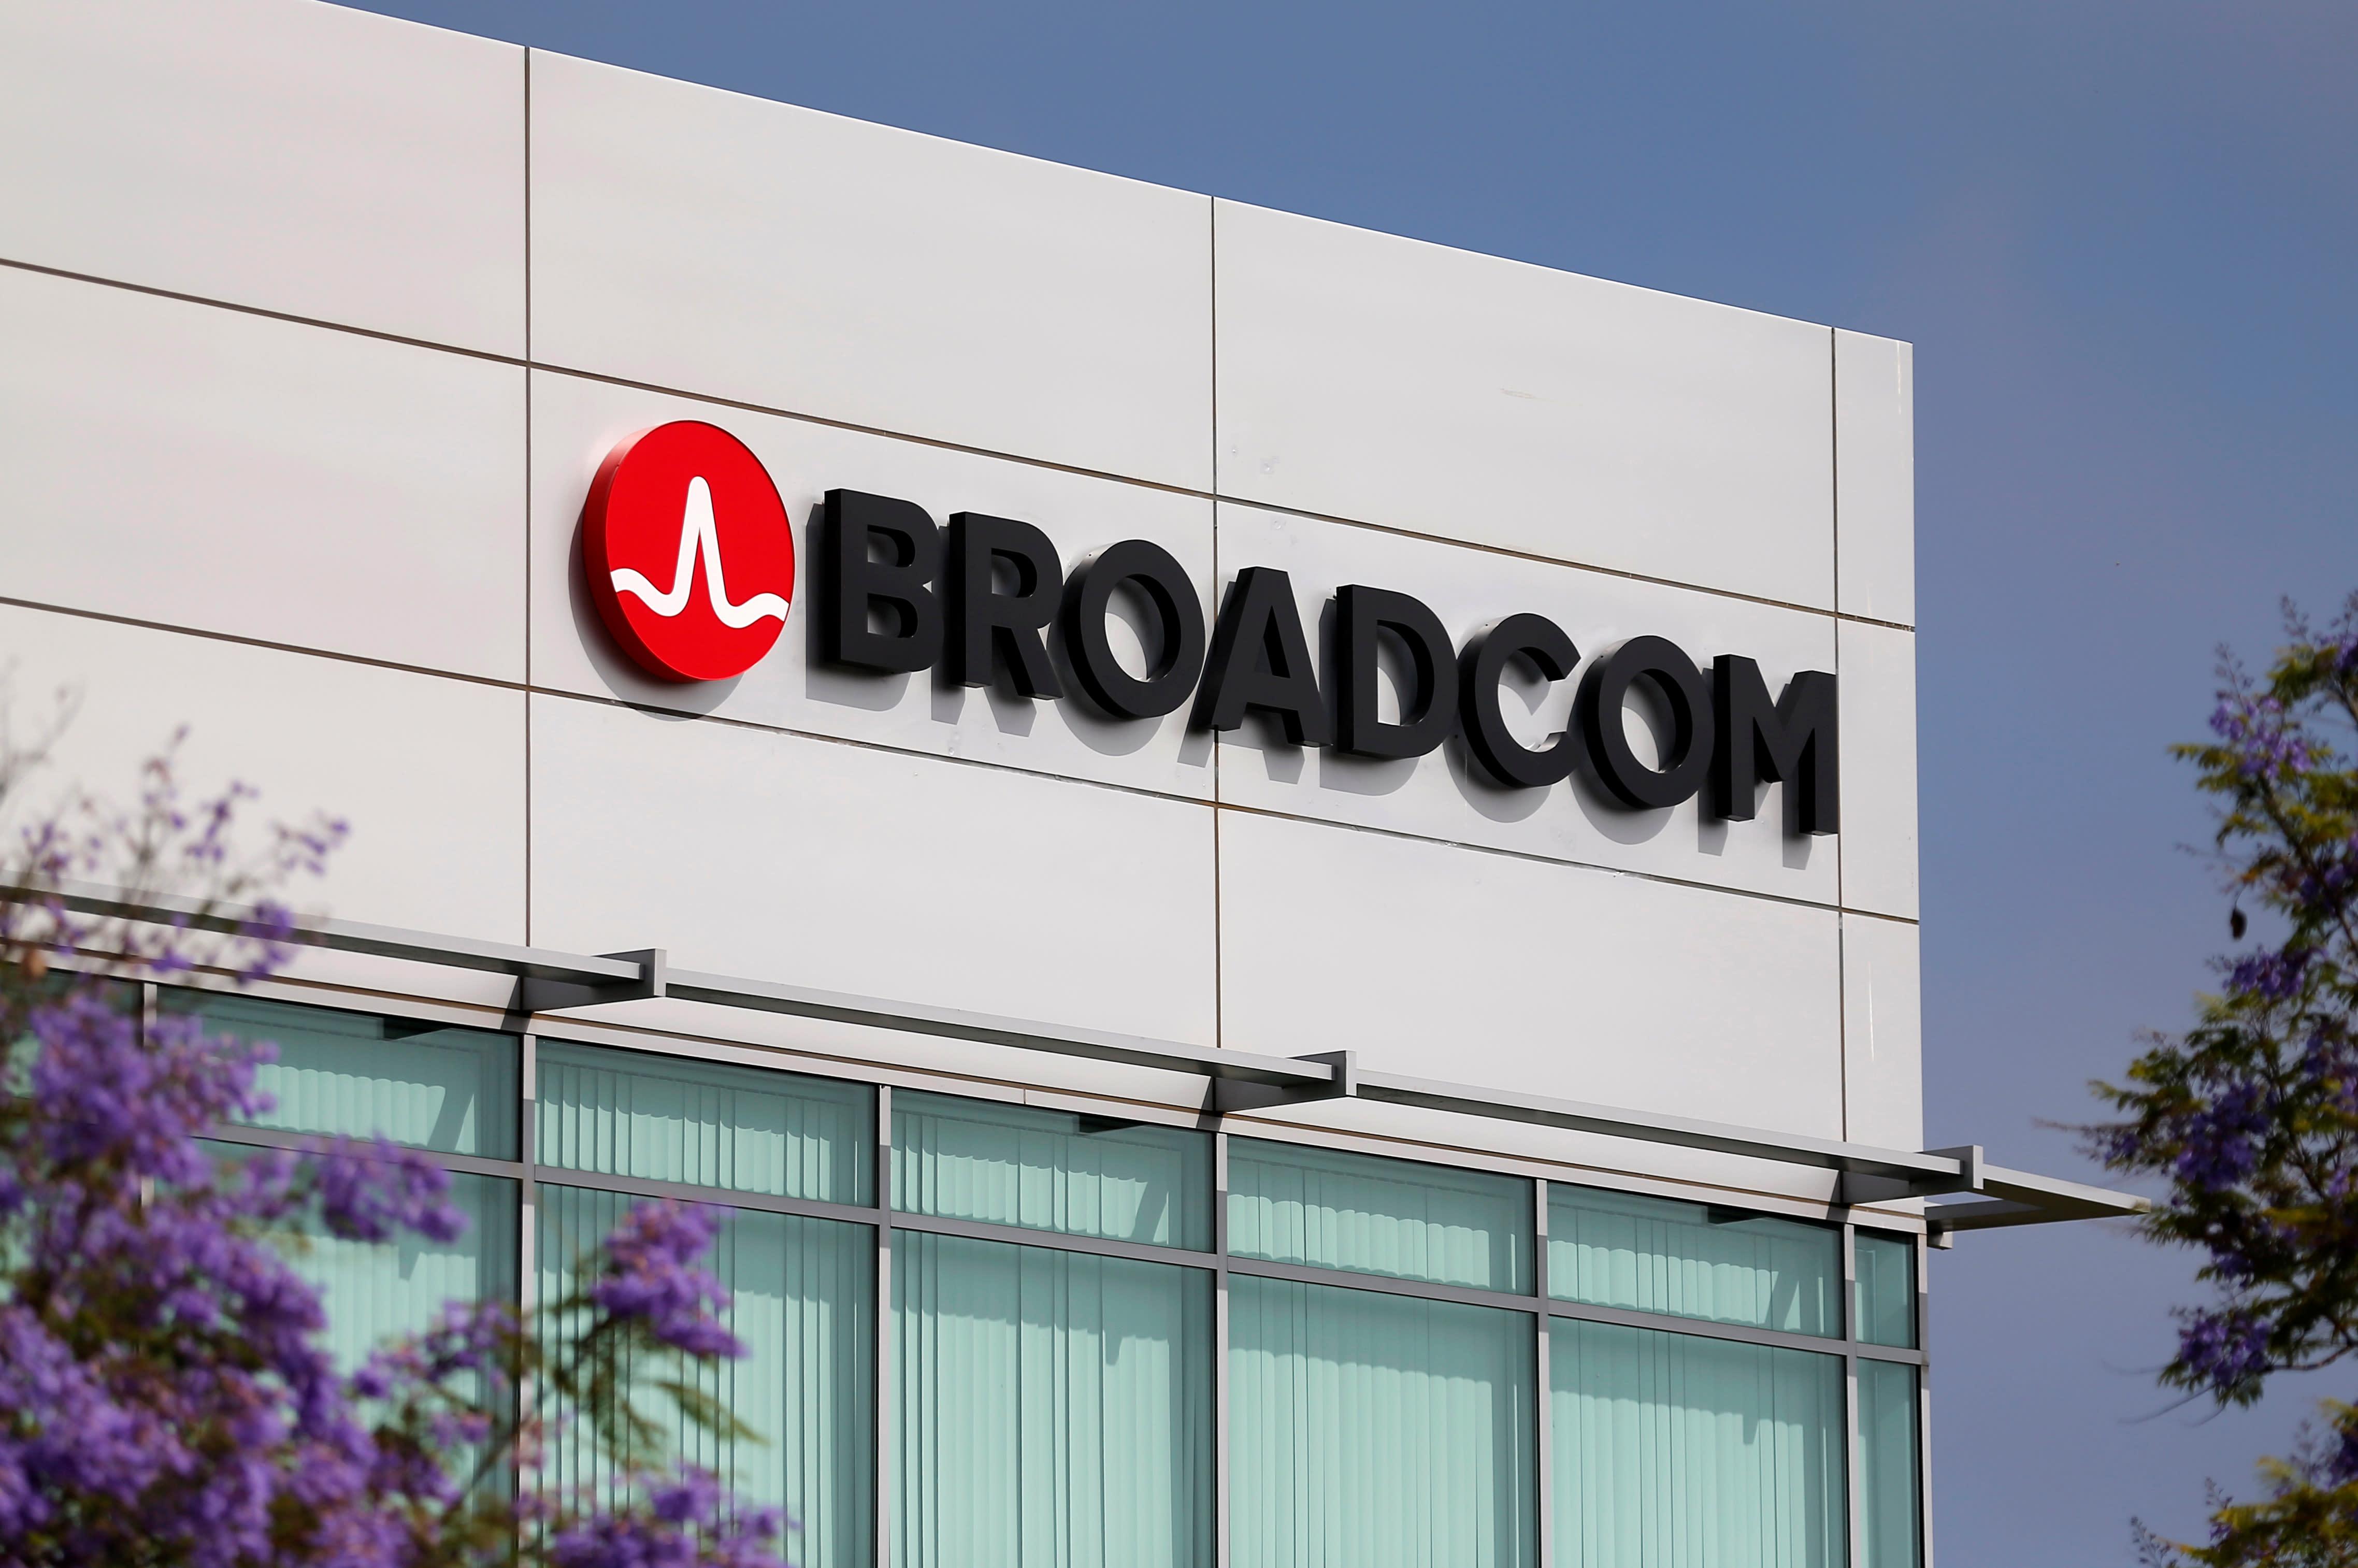 Broadcom, Amazon, Uber, SoftBank, Bayer: Companies to Watch